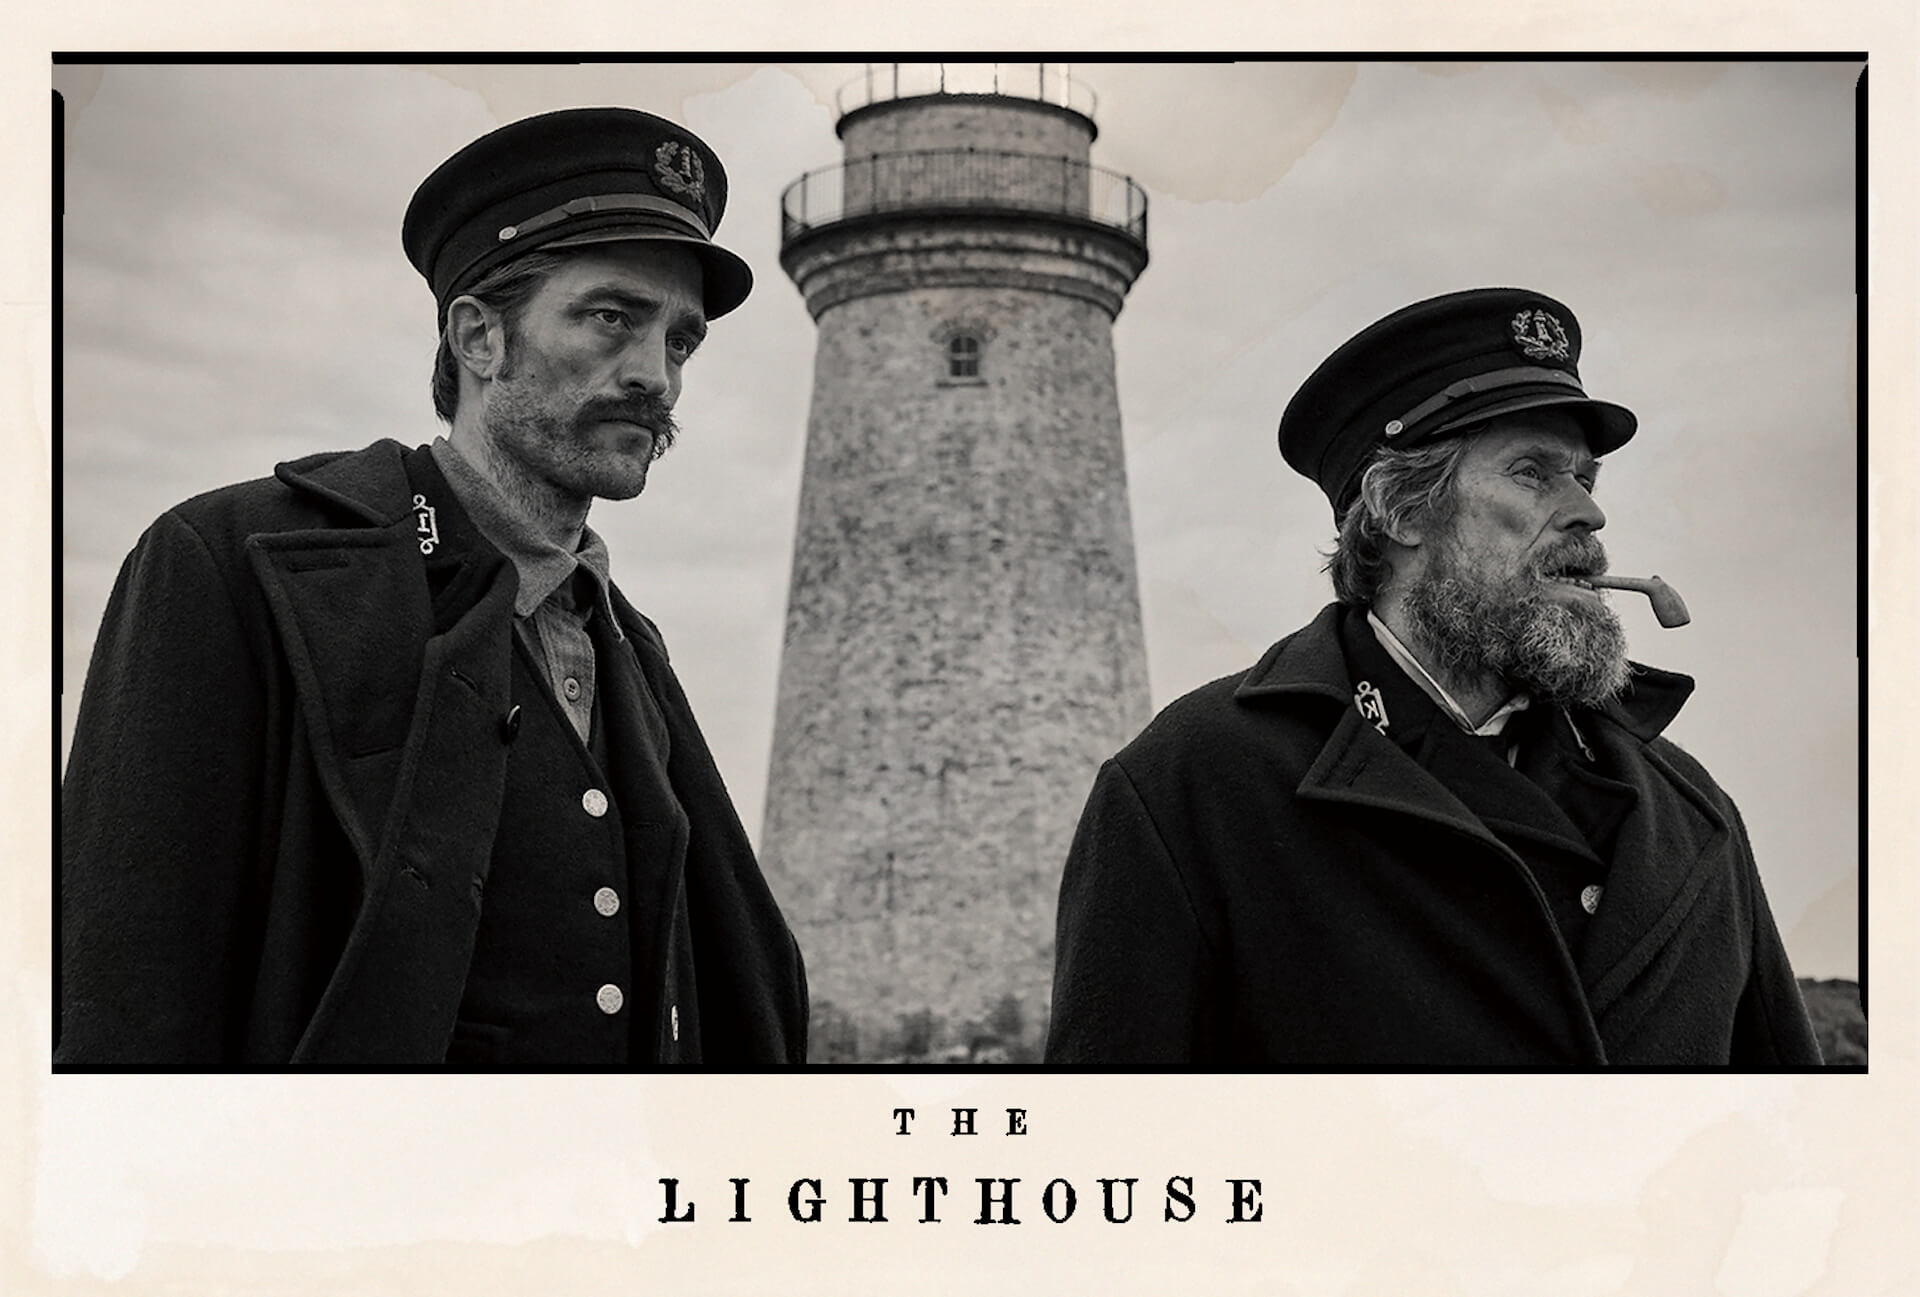 A24、狂気の問題作『ライトハウス』が7月日本公開!シーン写真4点解禁&特典付きムビチケ発売決定 film210326_thelighthouse_3